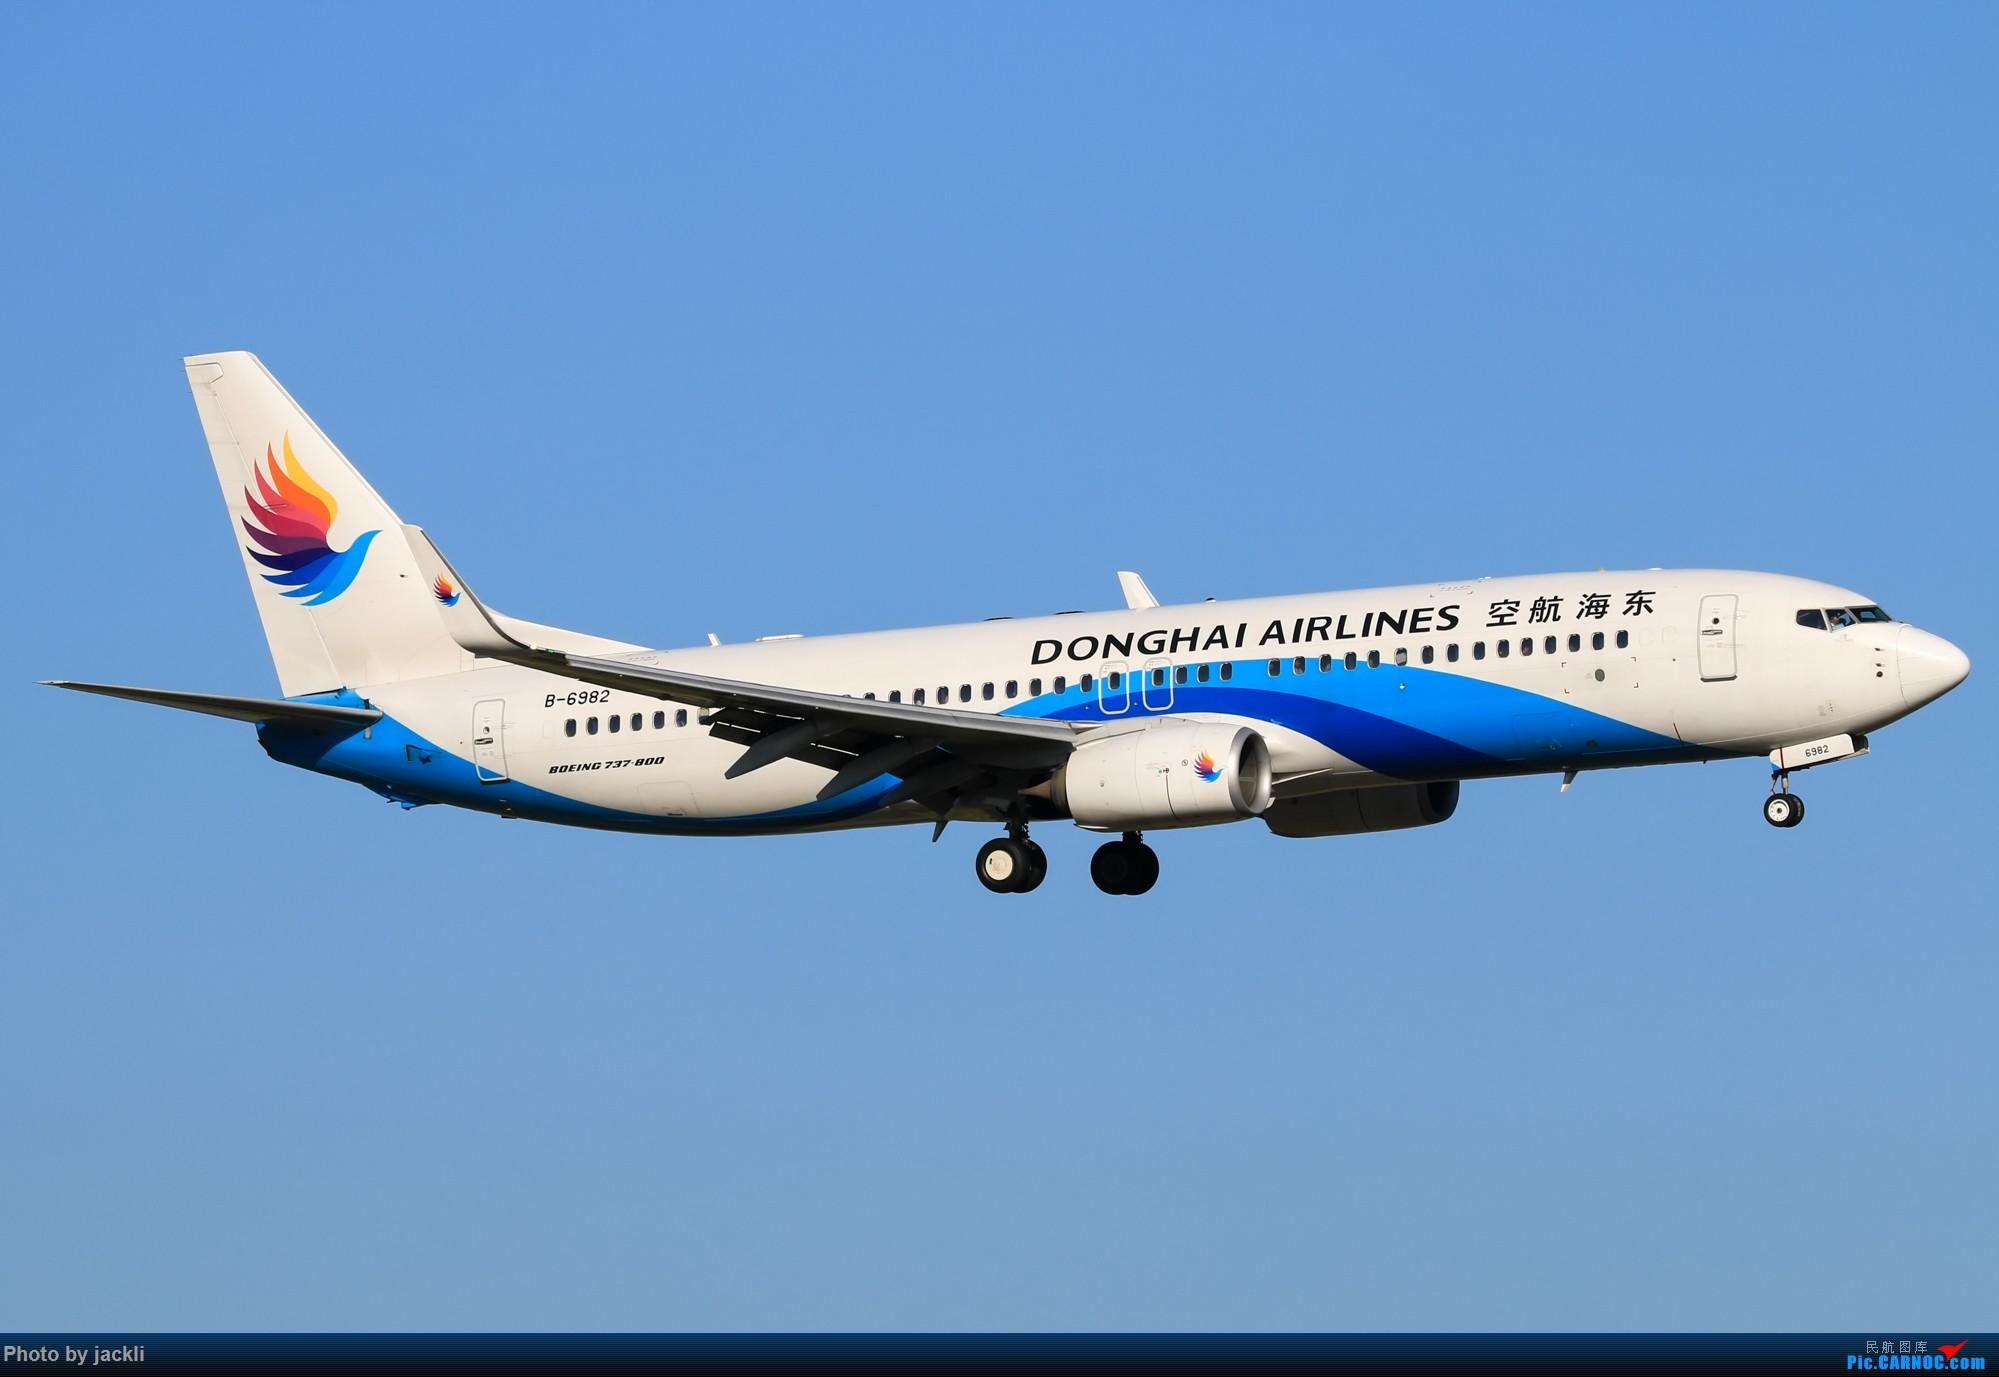 Re:[原创]【JackLi】抓住好天的尾巴~川航330在珠海训练~ BOEING 737-800 B-6982 中国珠海金湾机场